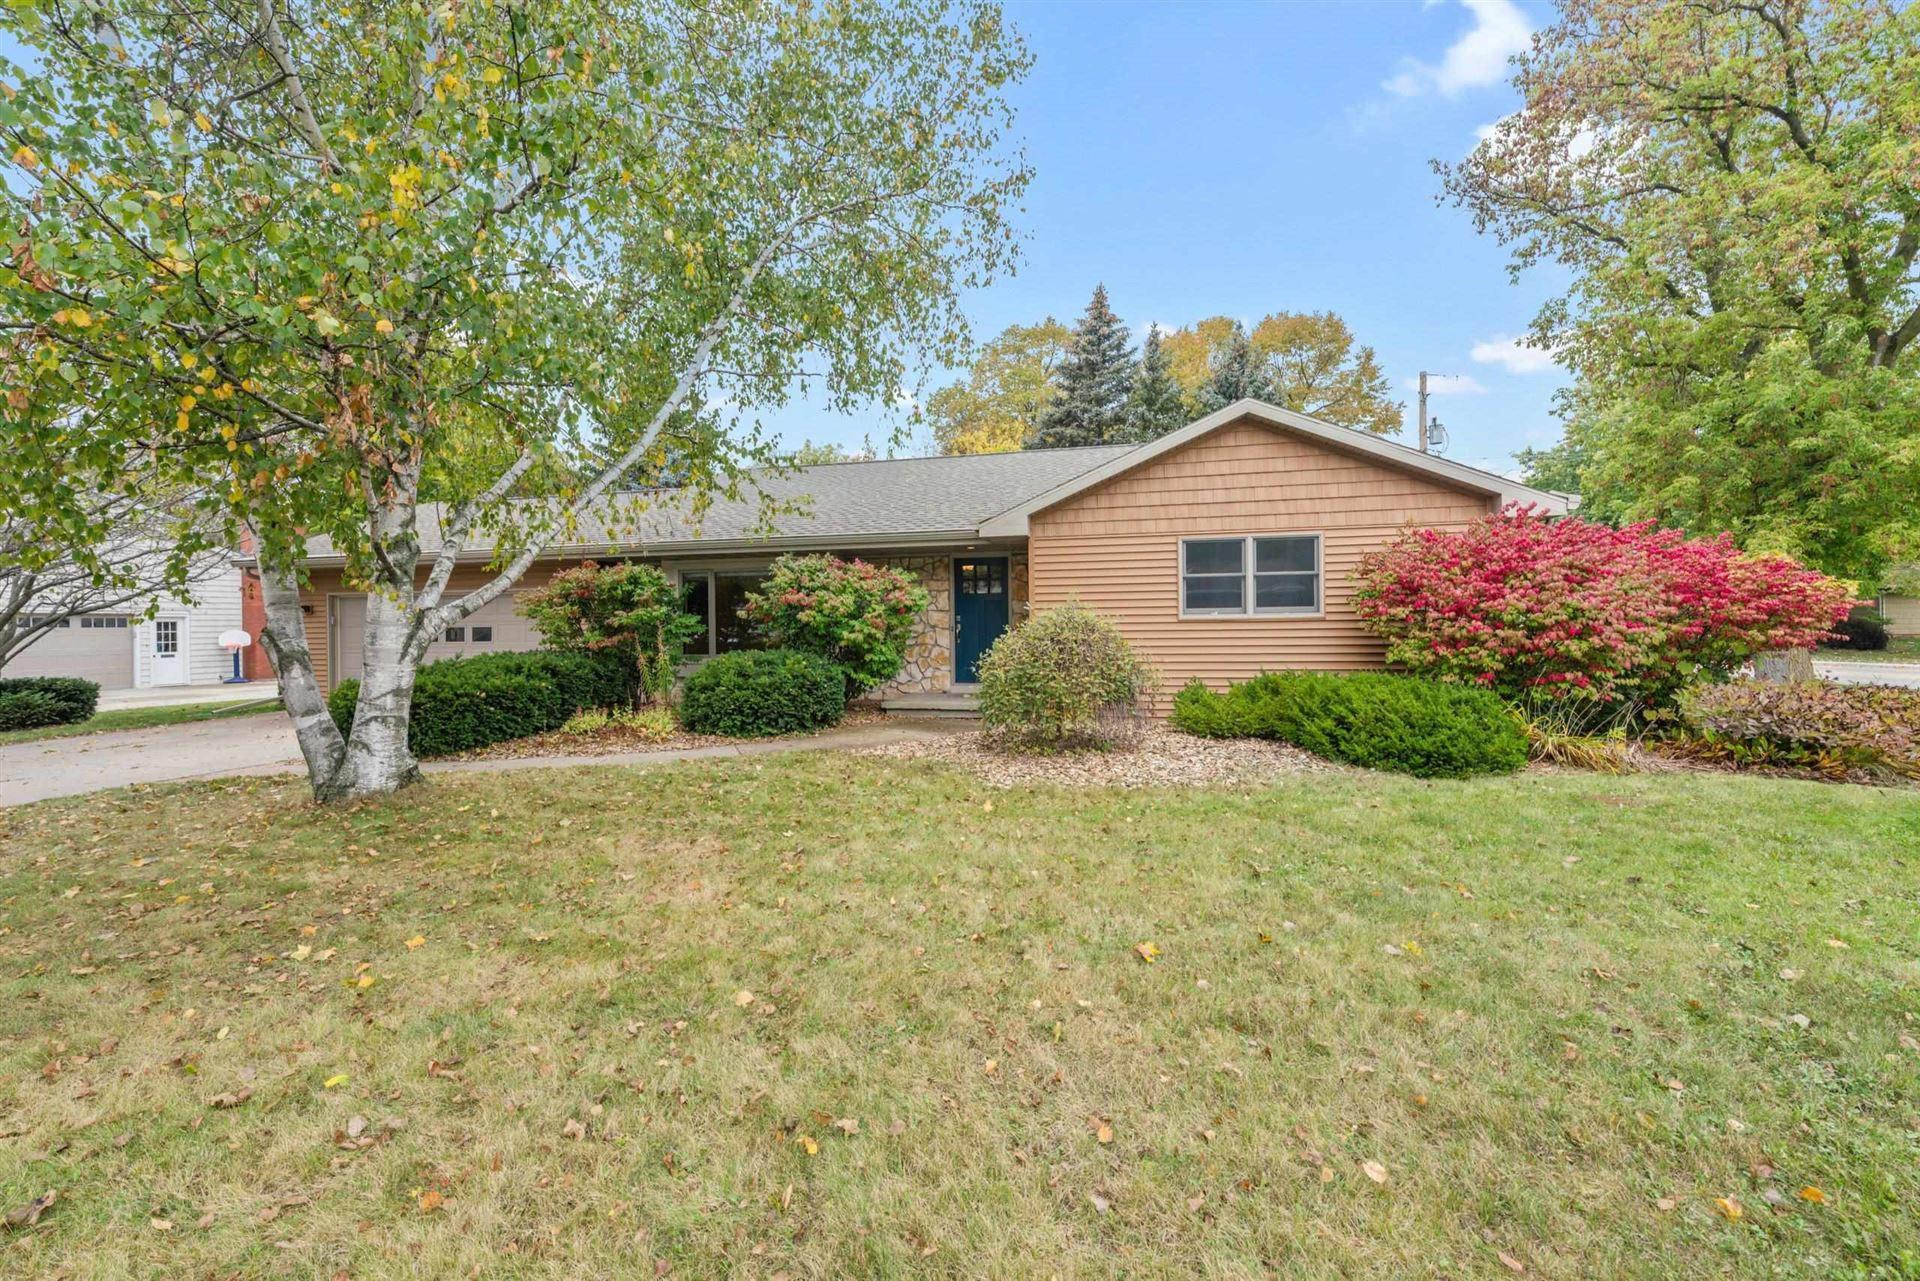 1605 S HILLCREST Drive, Appleton, WI 54914 - MLS#: 50249401